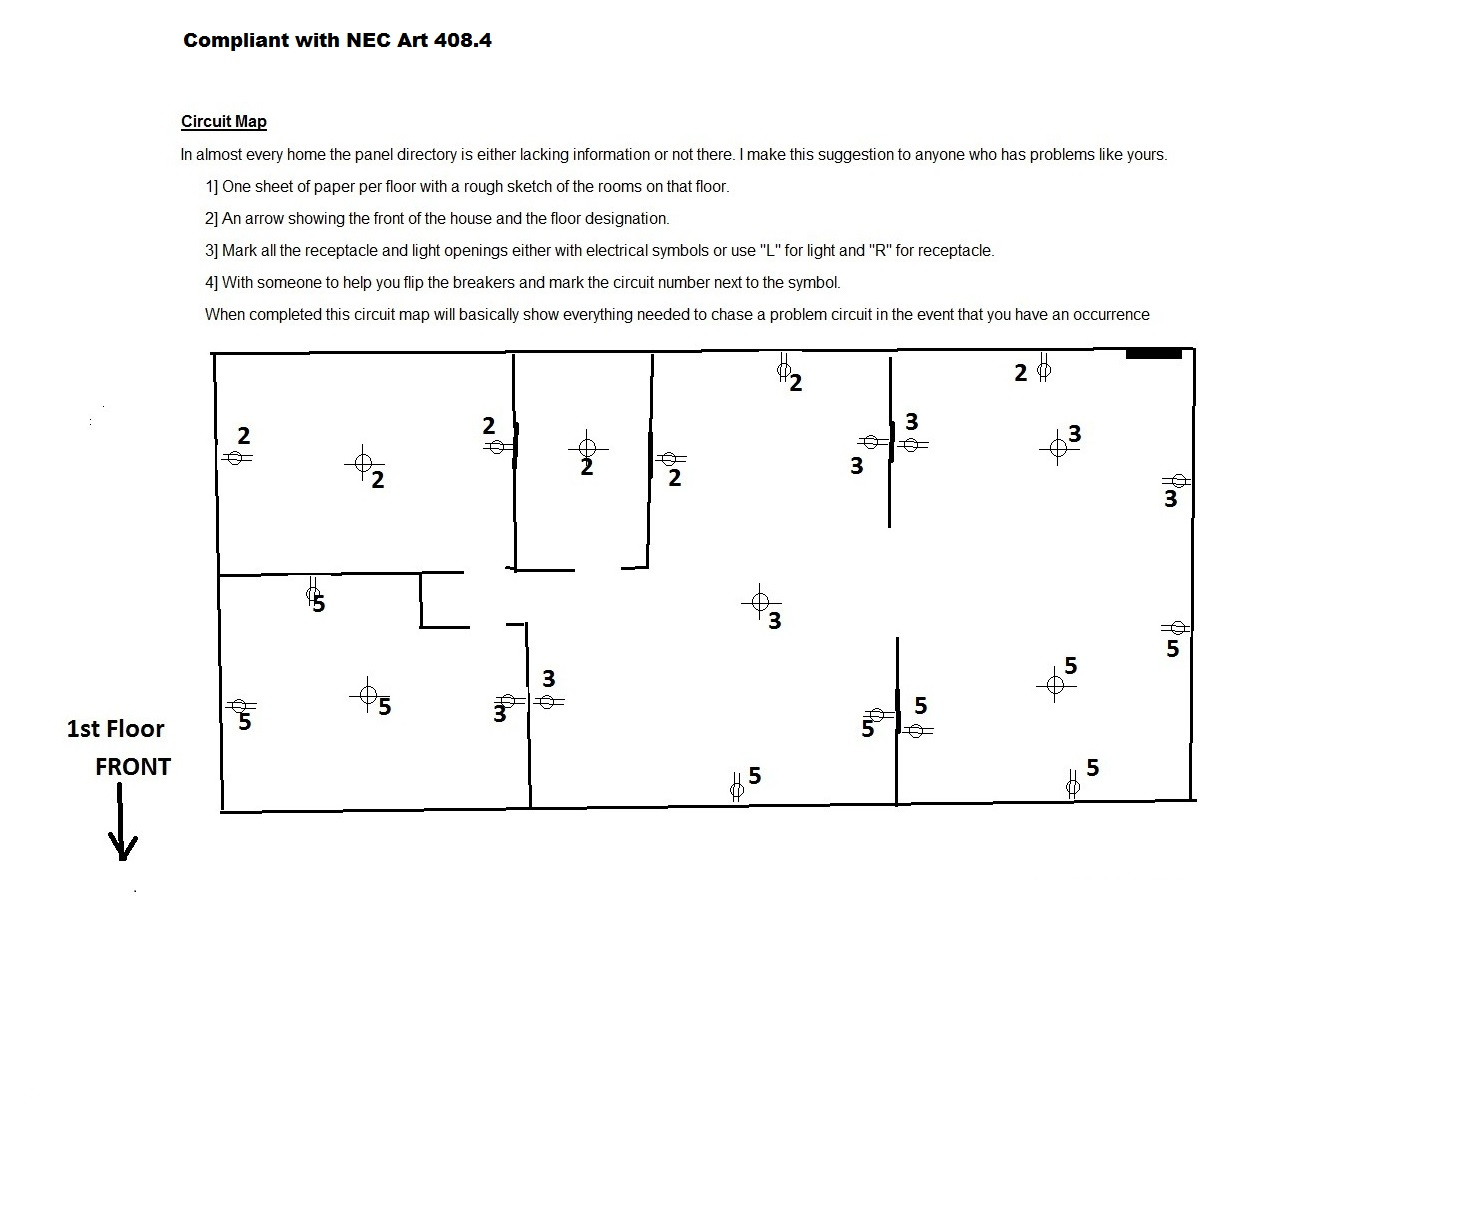 4c9a1038-2b4f-474b-ab9f-ea9c97e99aa8_Circuit Map.jpg